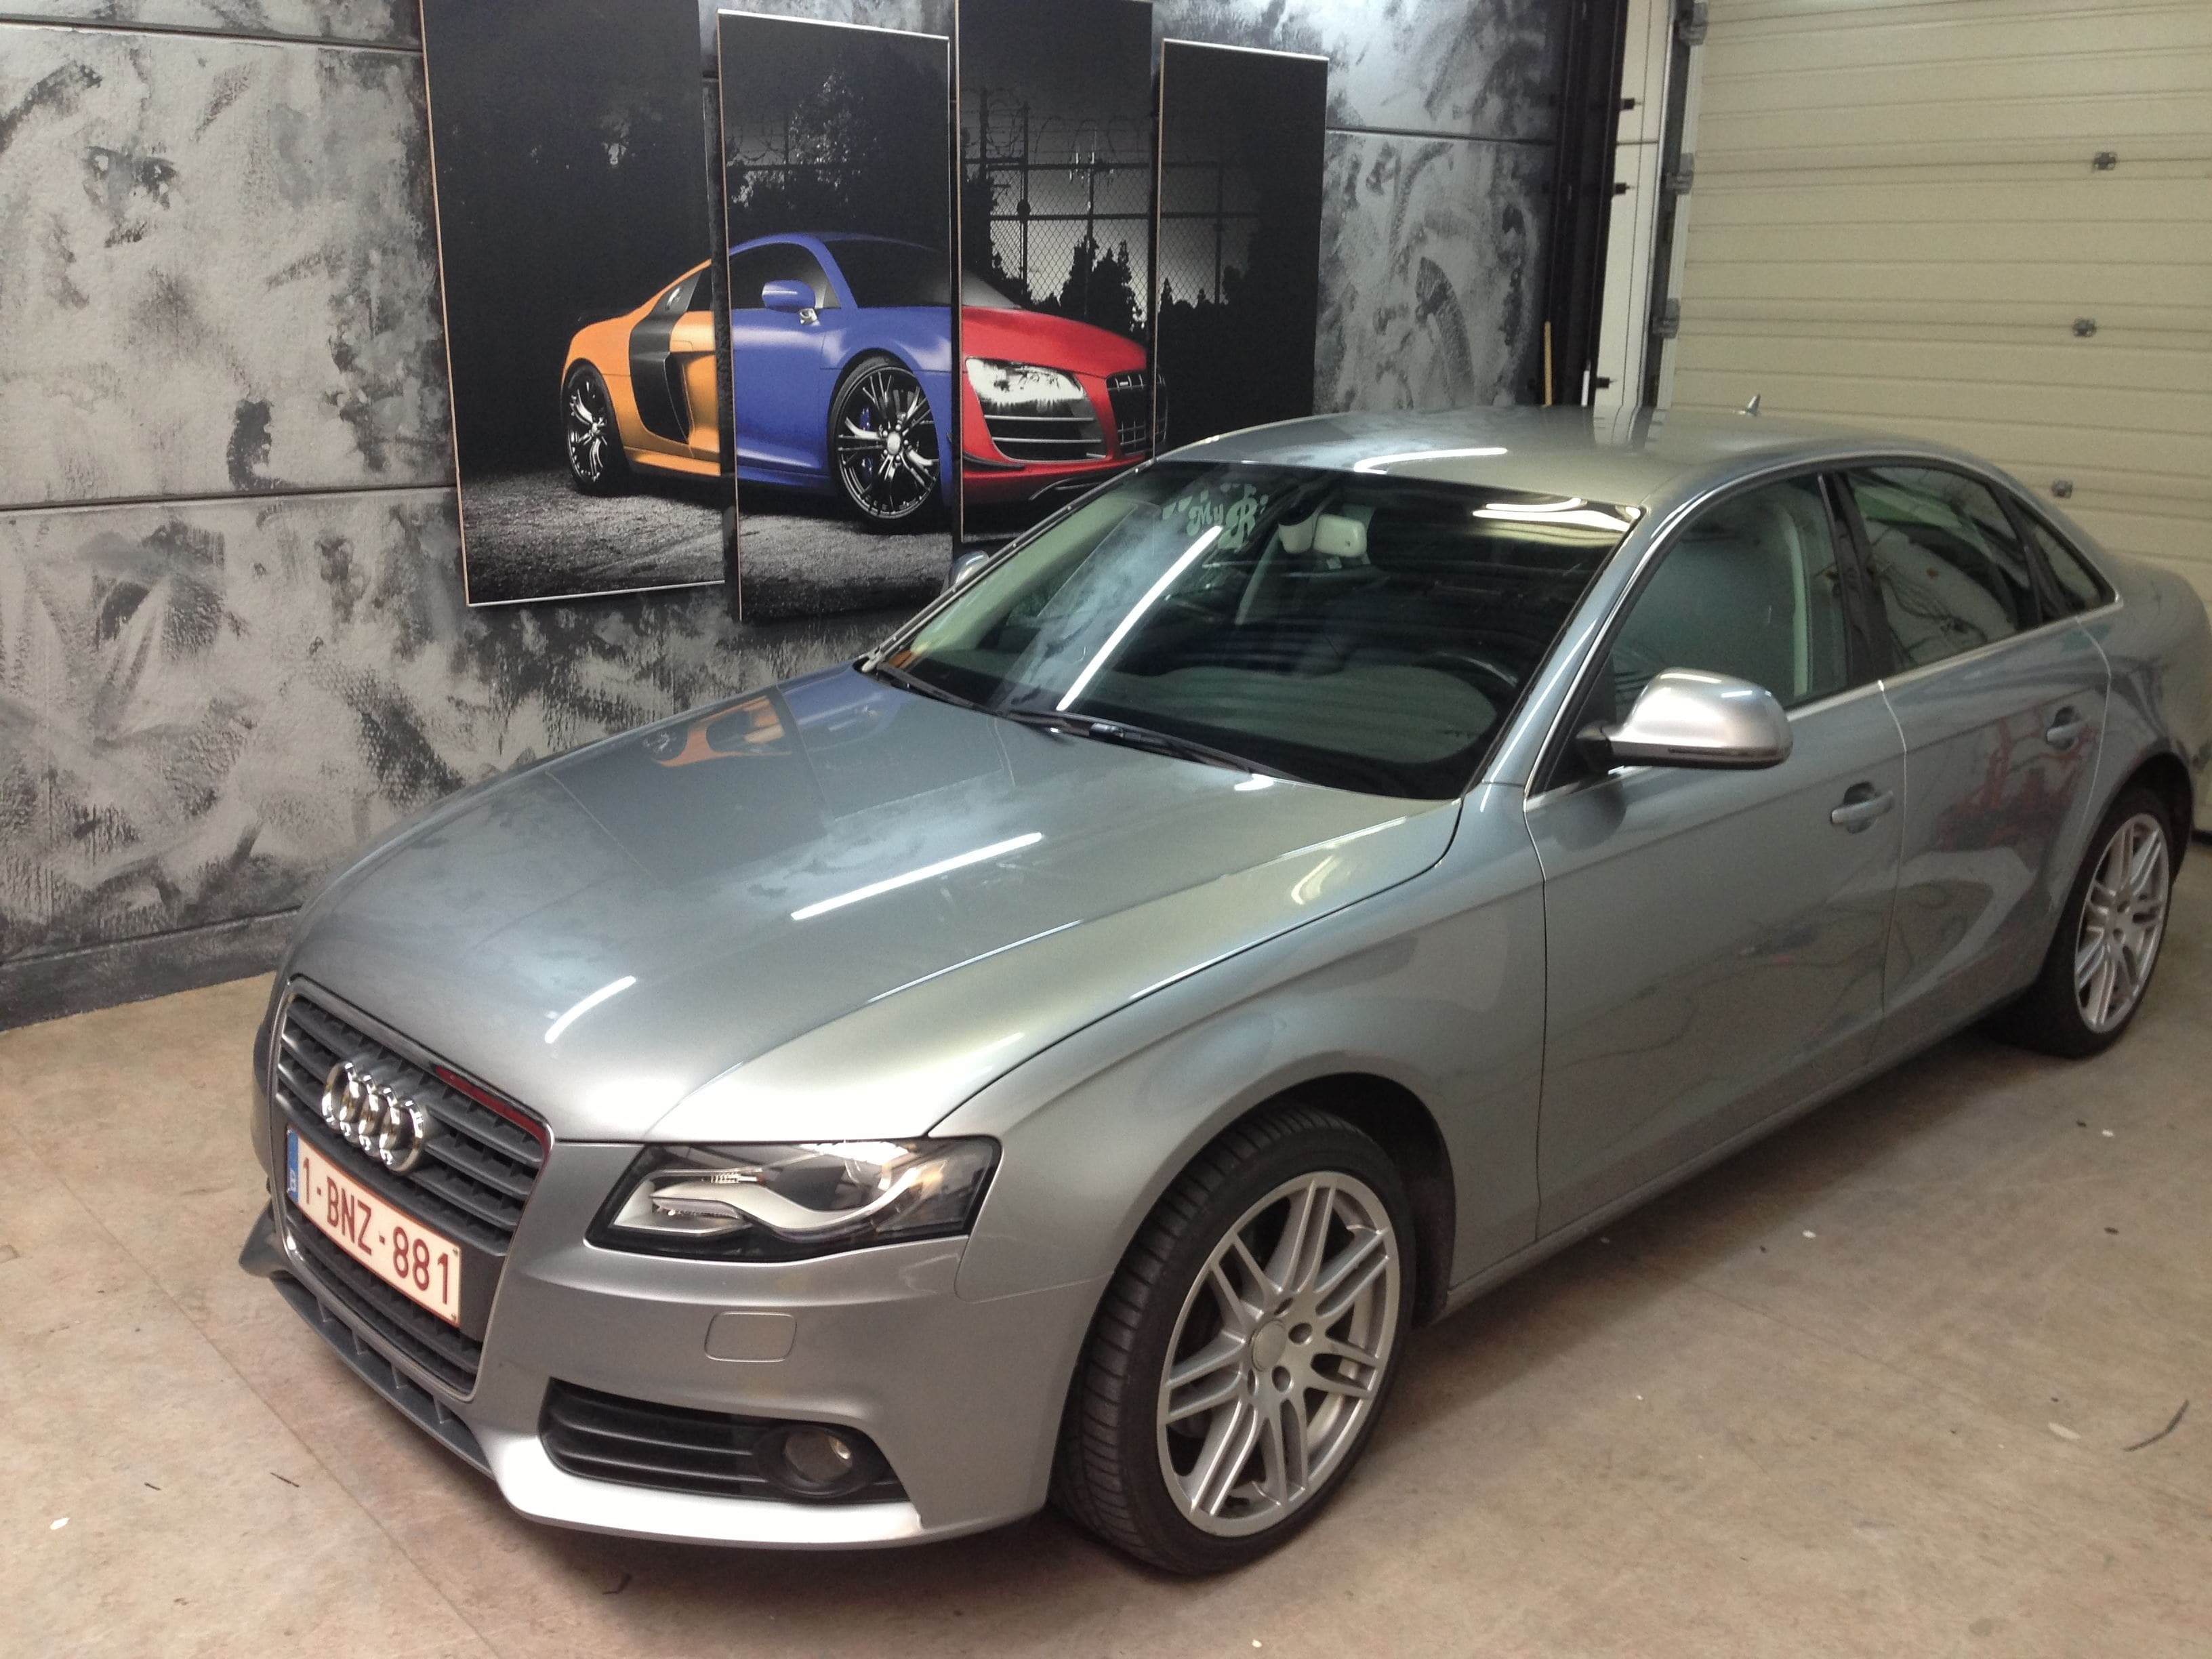 Audi A4 B6 met Gunpowder Wrap, Carwrapping door Wrapmyride.nu Foto-nr:4502, ©2021